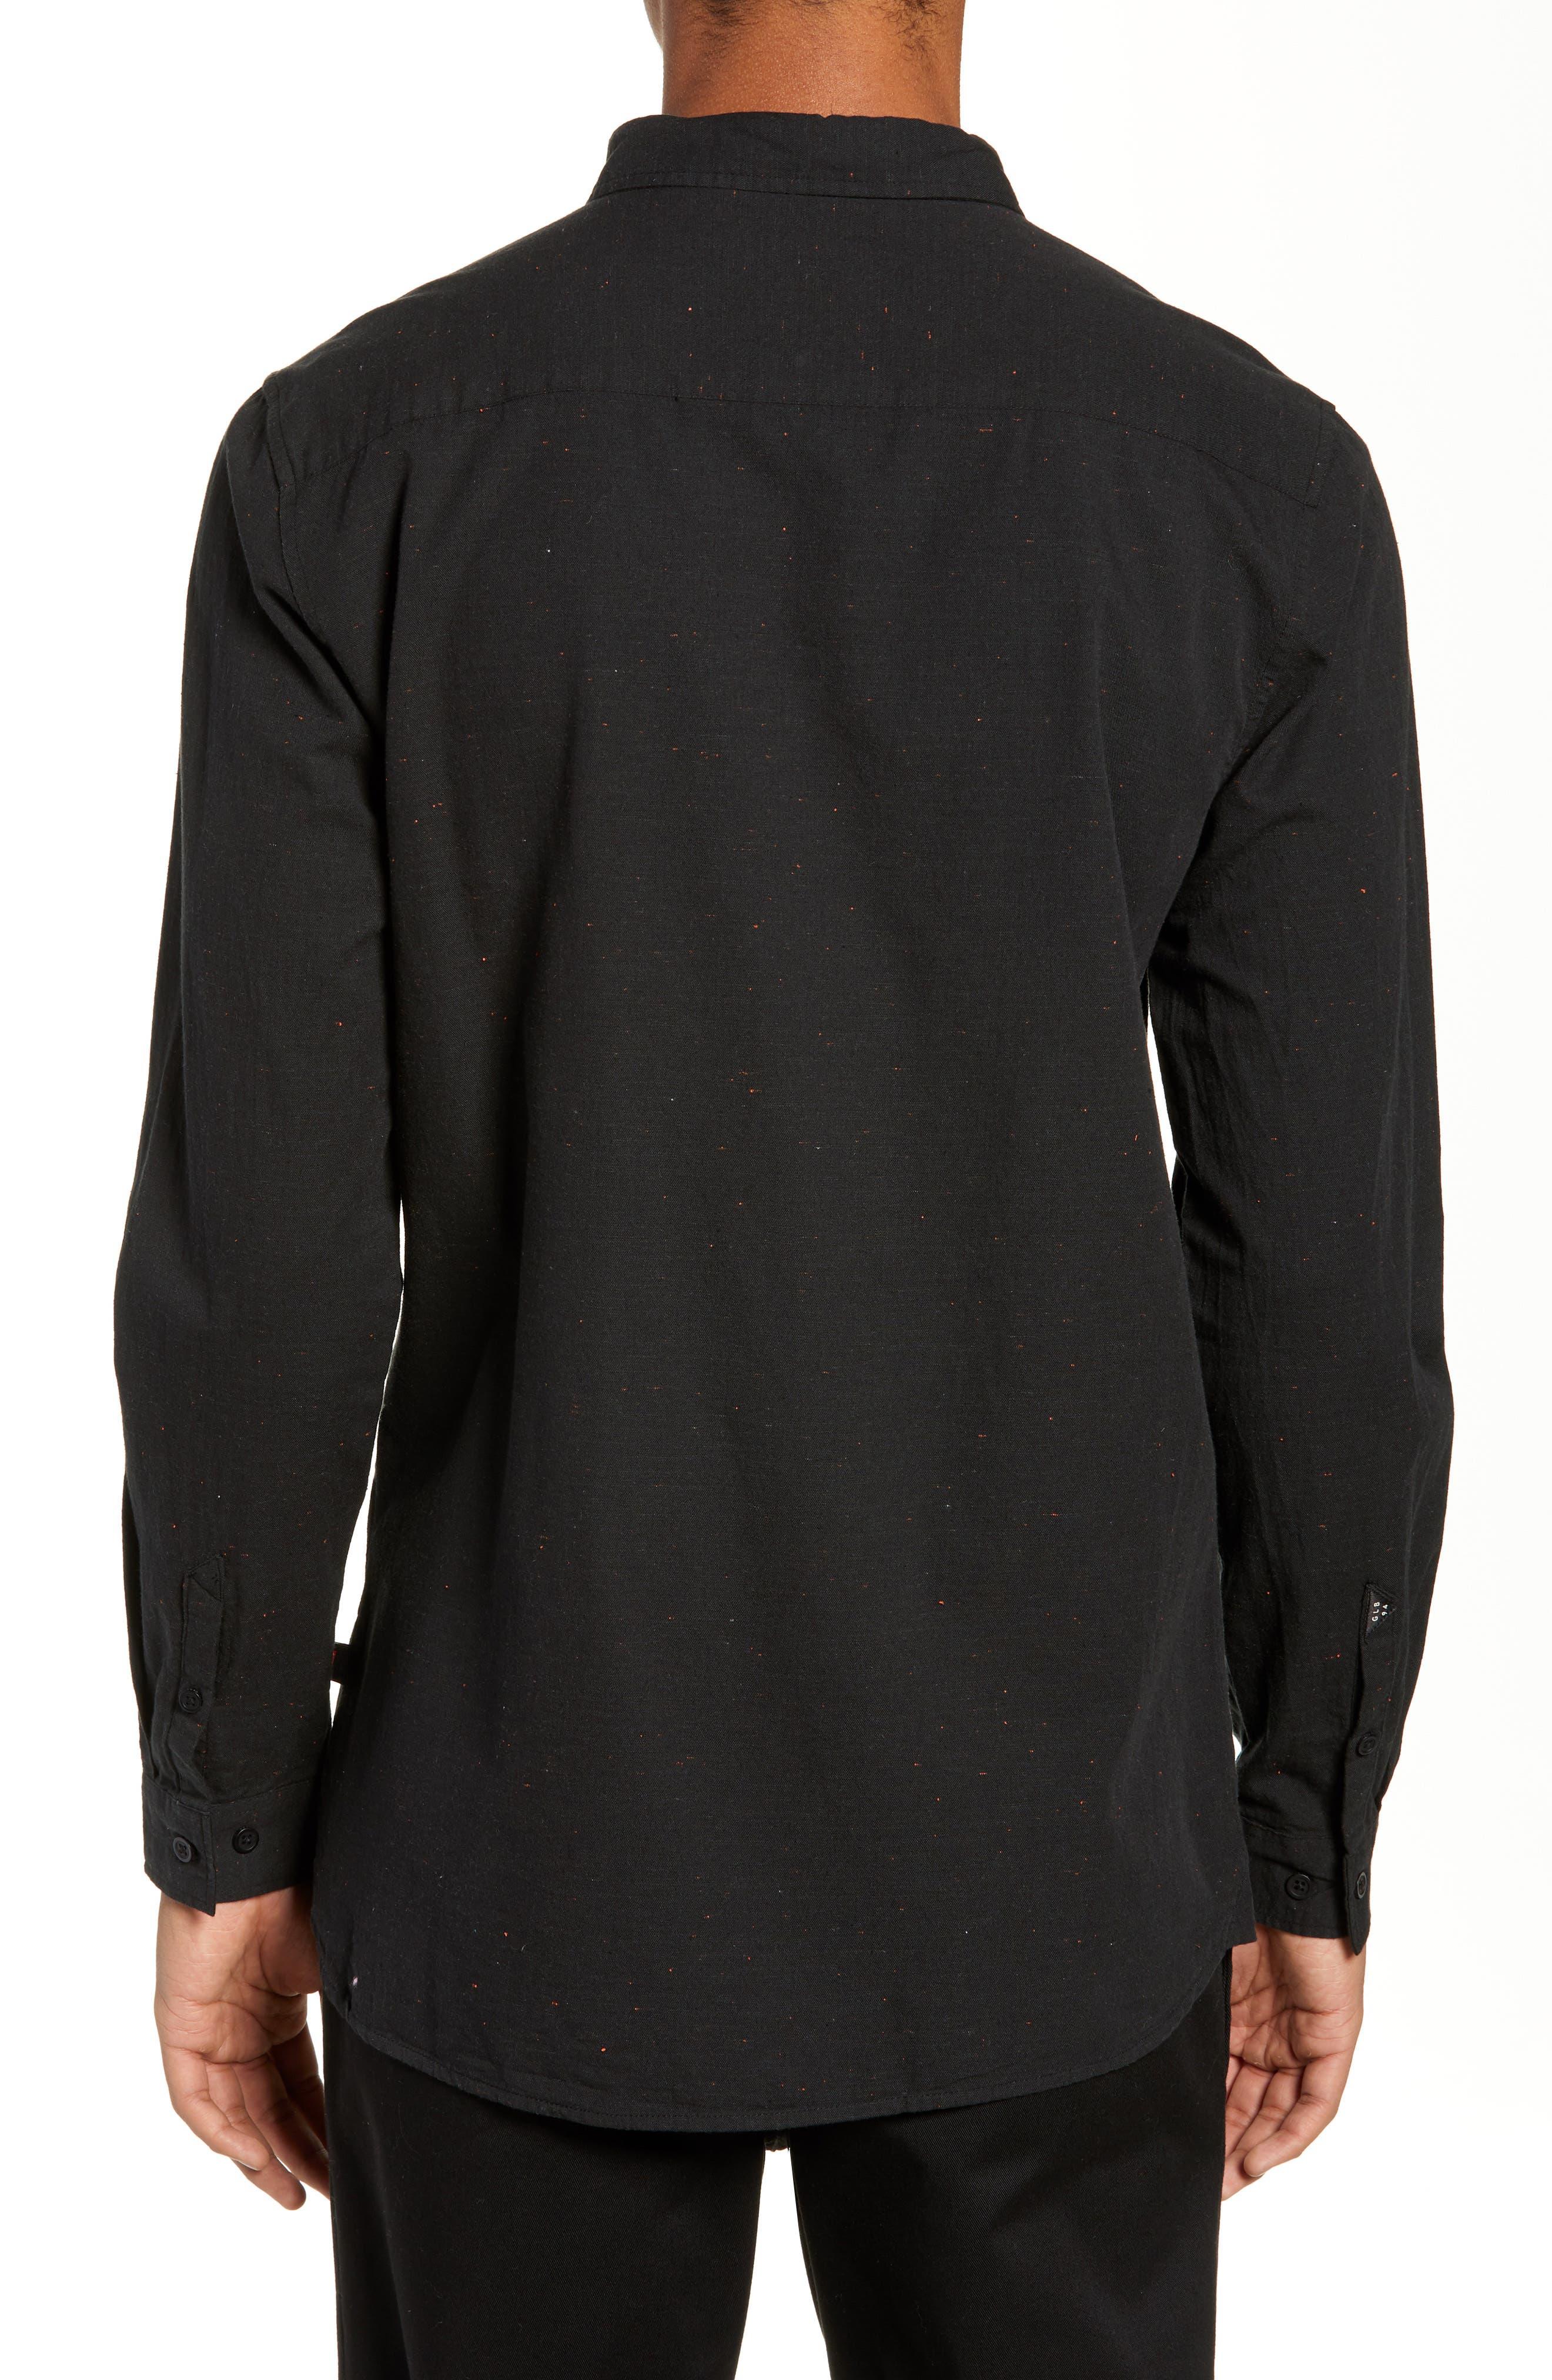 Goodstock Long Sleeve Shirt,                             Alternate thumbnail 2, color,                             LEAD